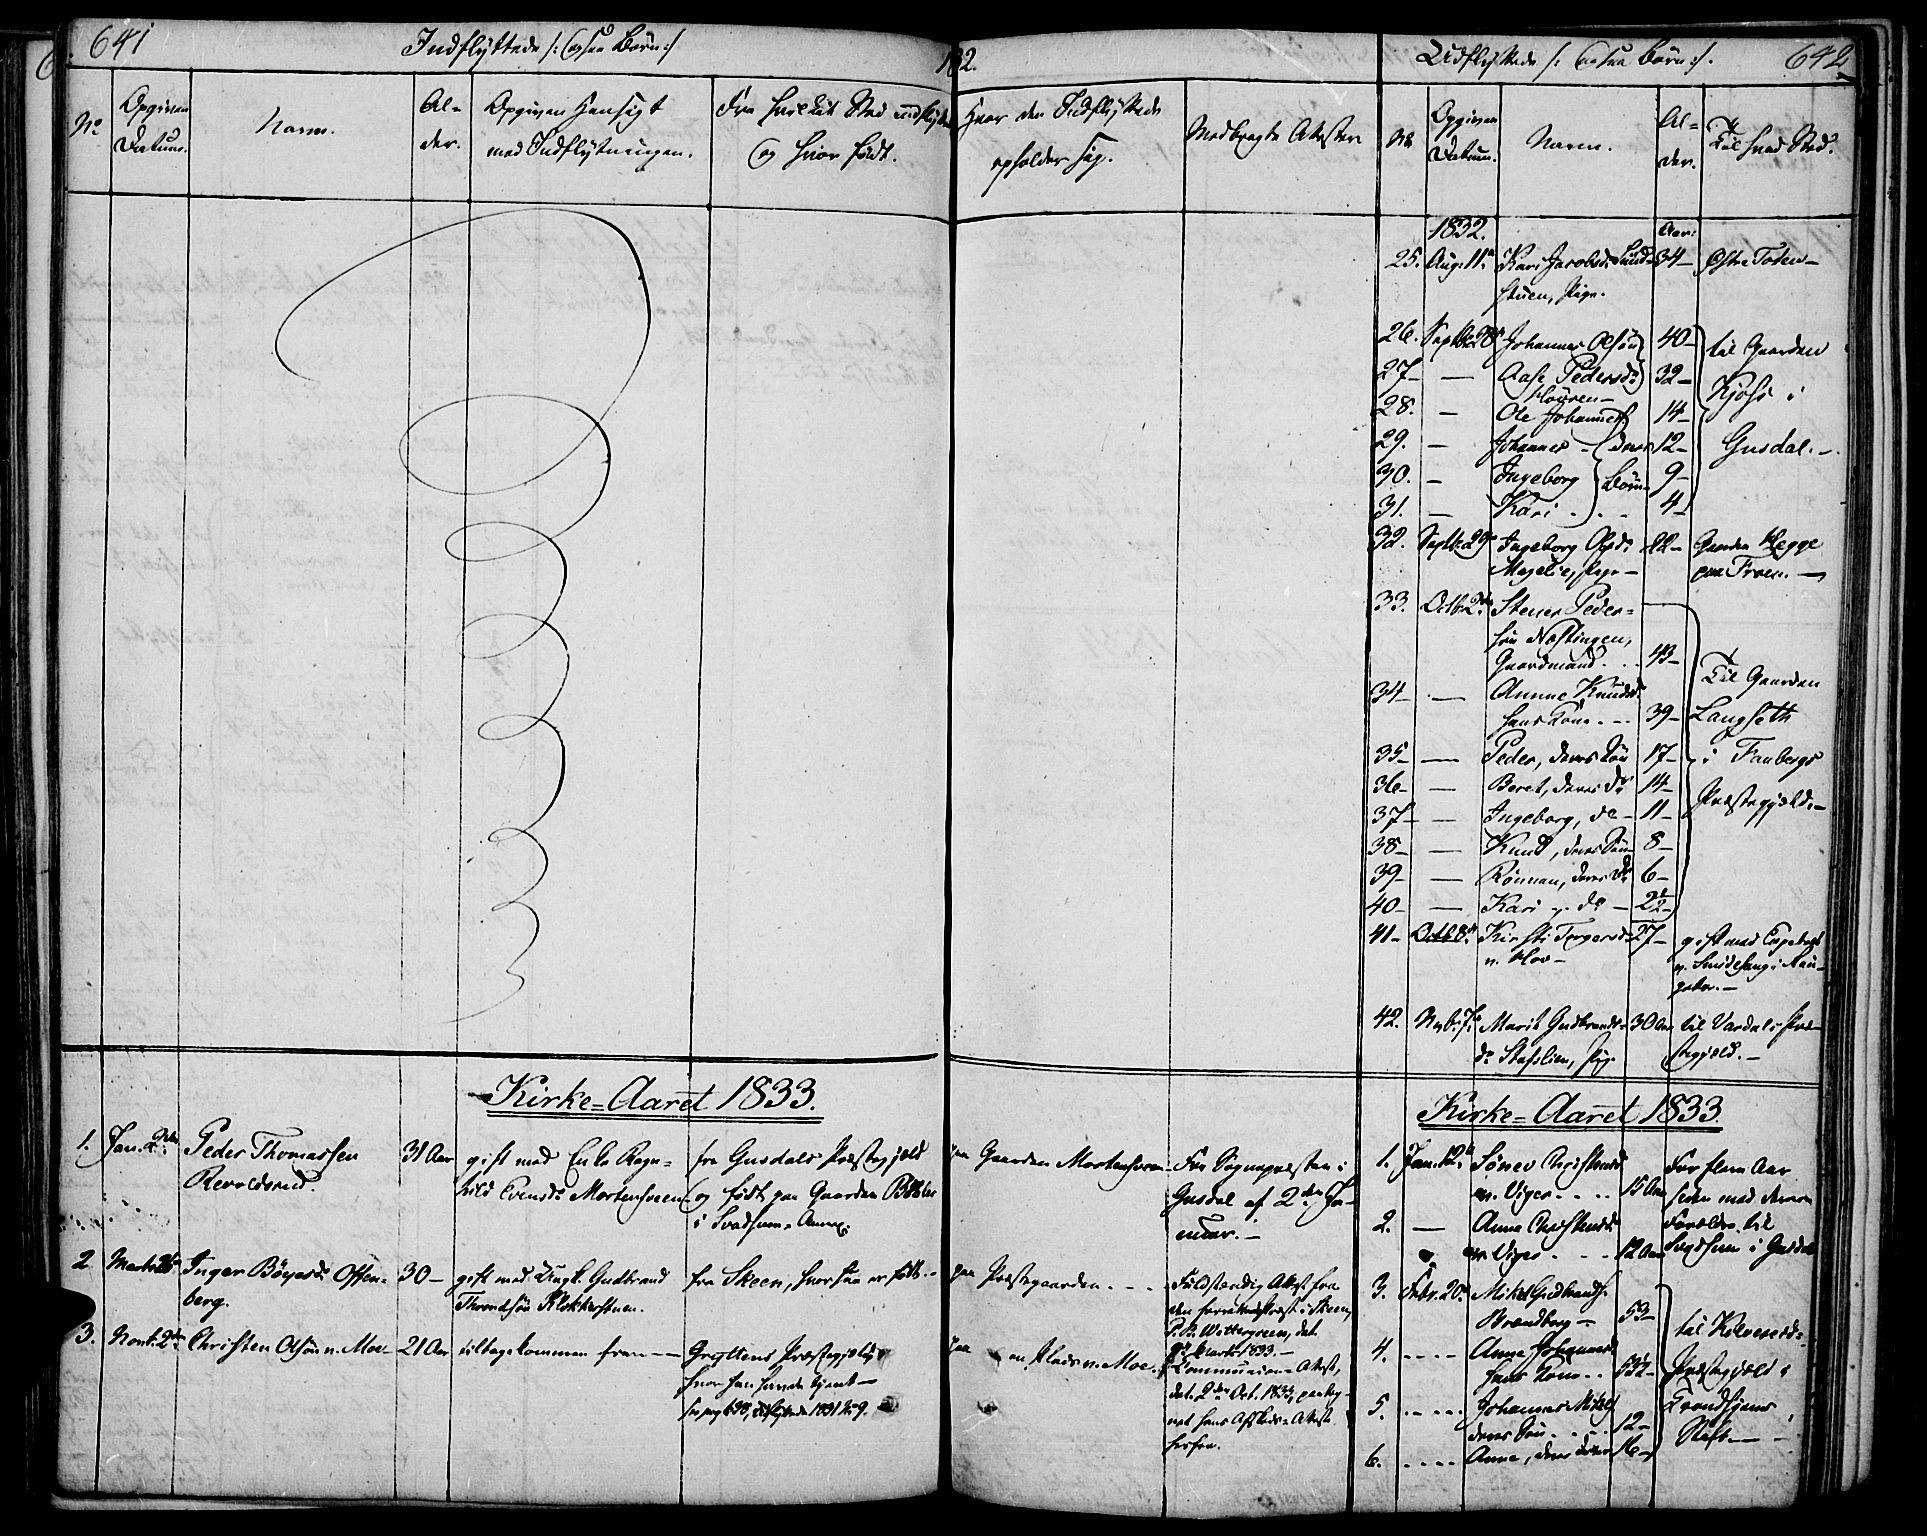 SAH, Øyer prestekontor, Ministerialbok nr. 4, 1824-1841, s. 641-642